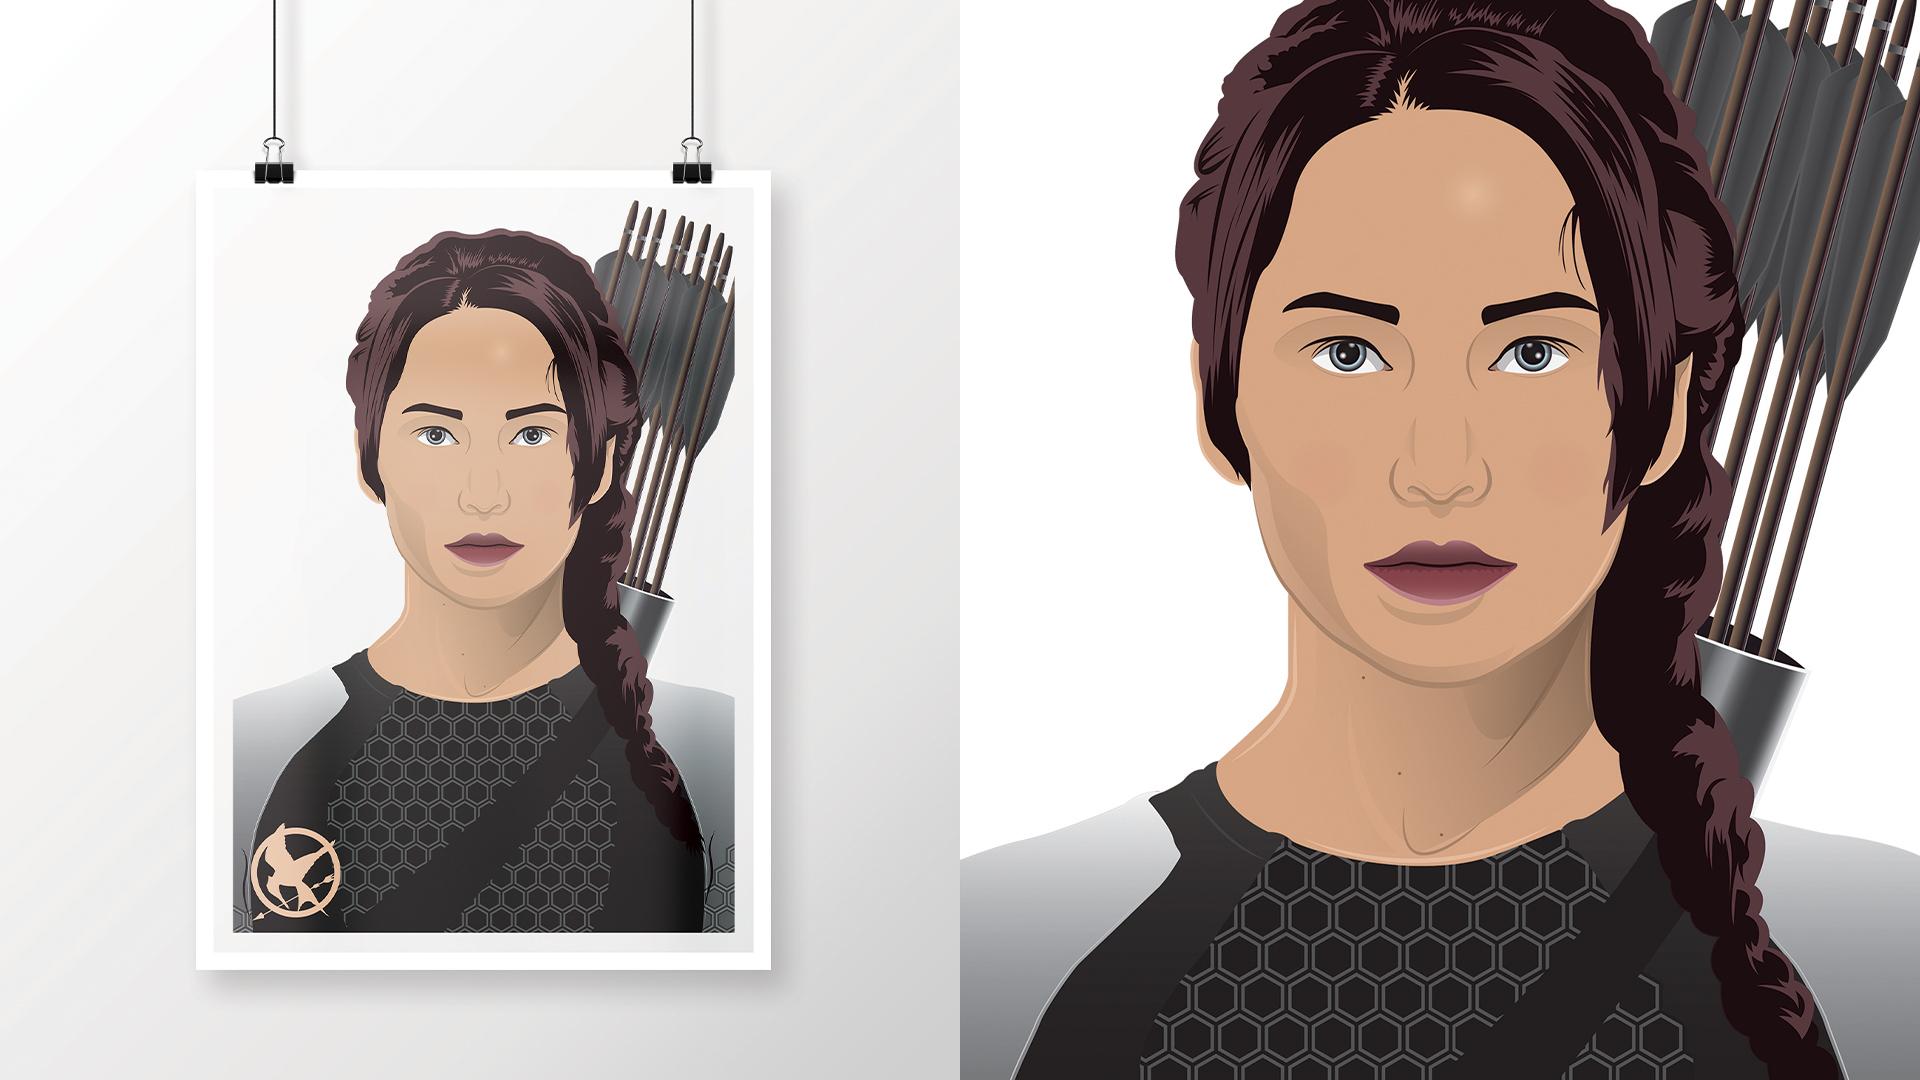 Jennifer Lawrence as Katniss Everdeen   As seen in The Hunger Games: Catching Fire